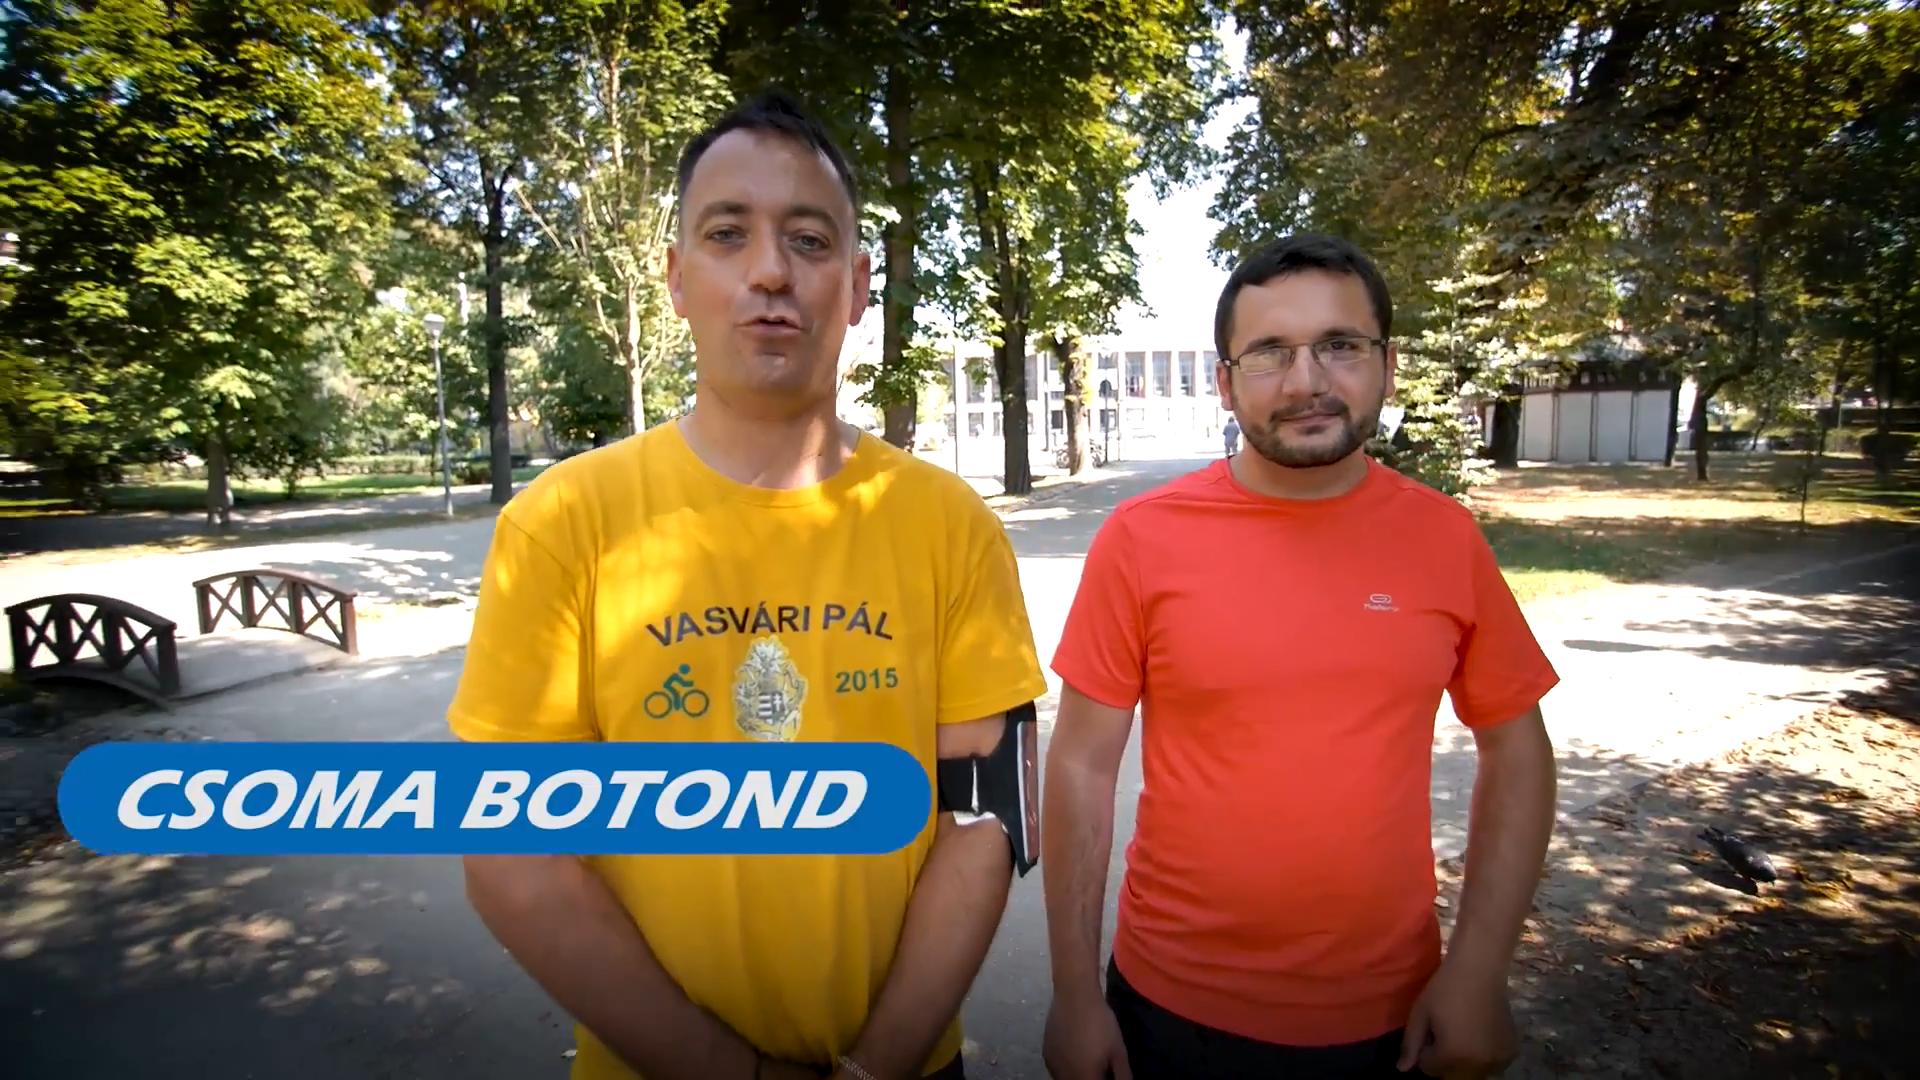 CSOMA BOTOND, FANCSALI ERNŐ- KMN DONATON 2018